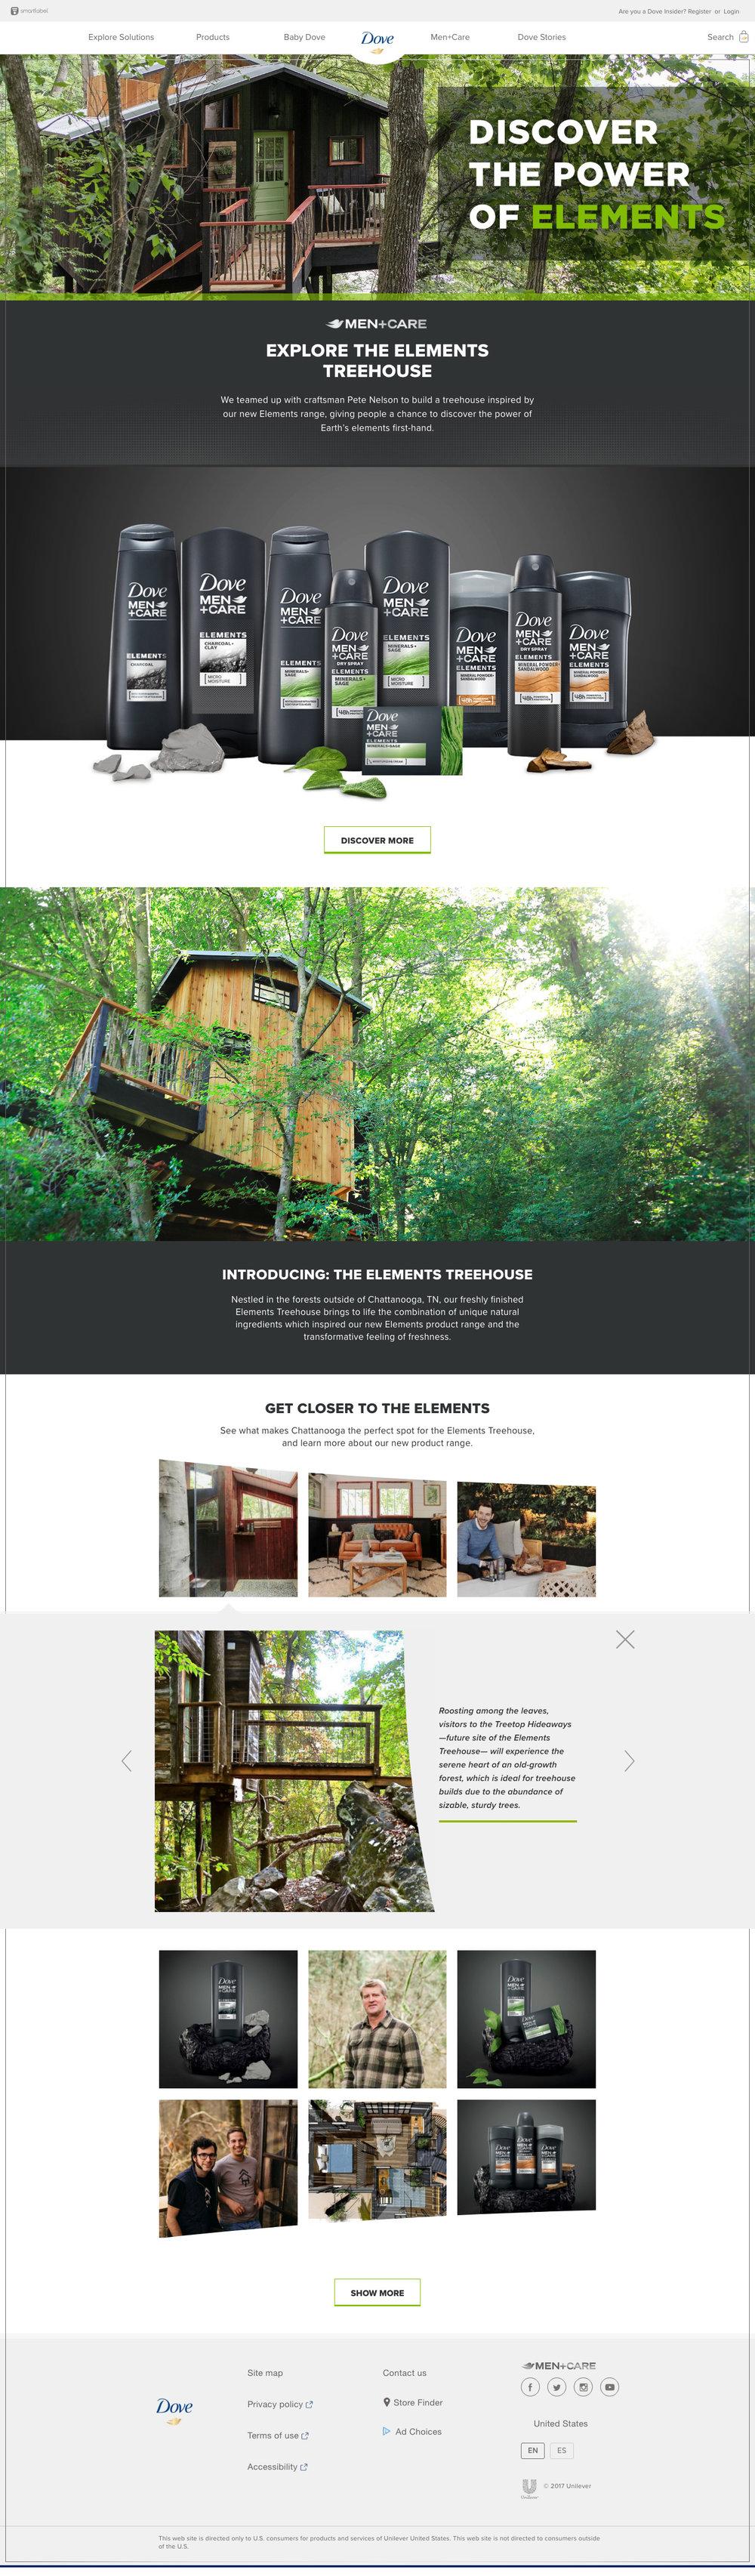 treehouse-psdc.jpg